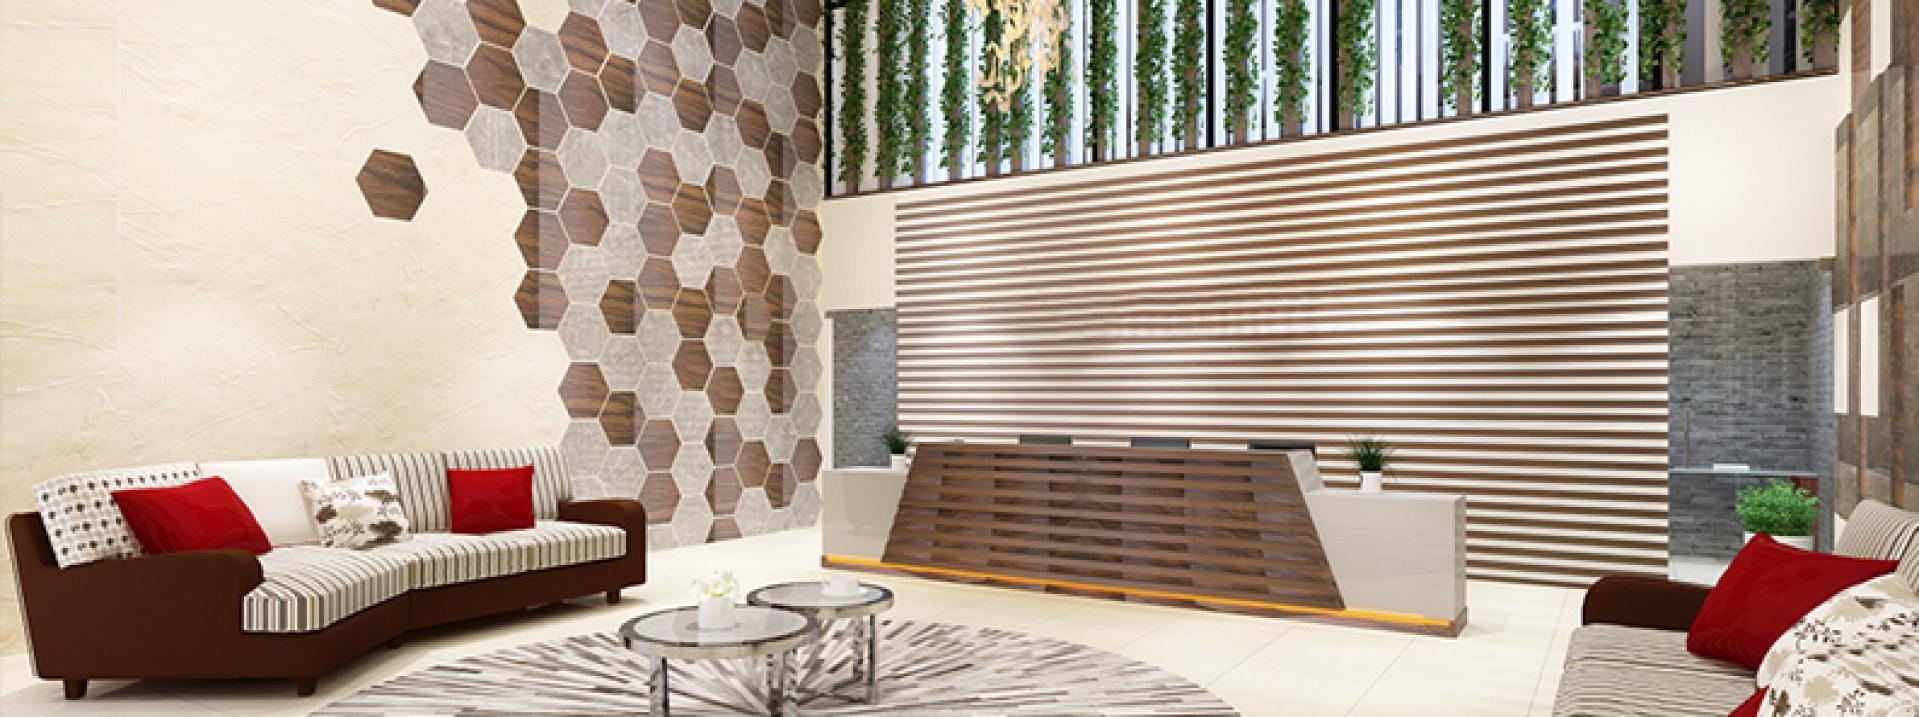 V-One-Hotel-Ambara -Elite-lobby-bengaluru